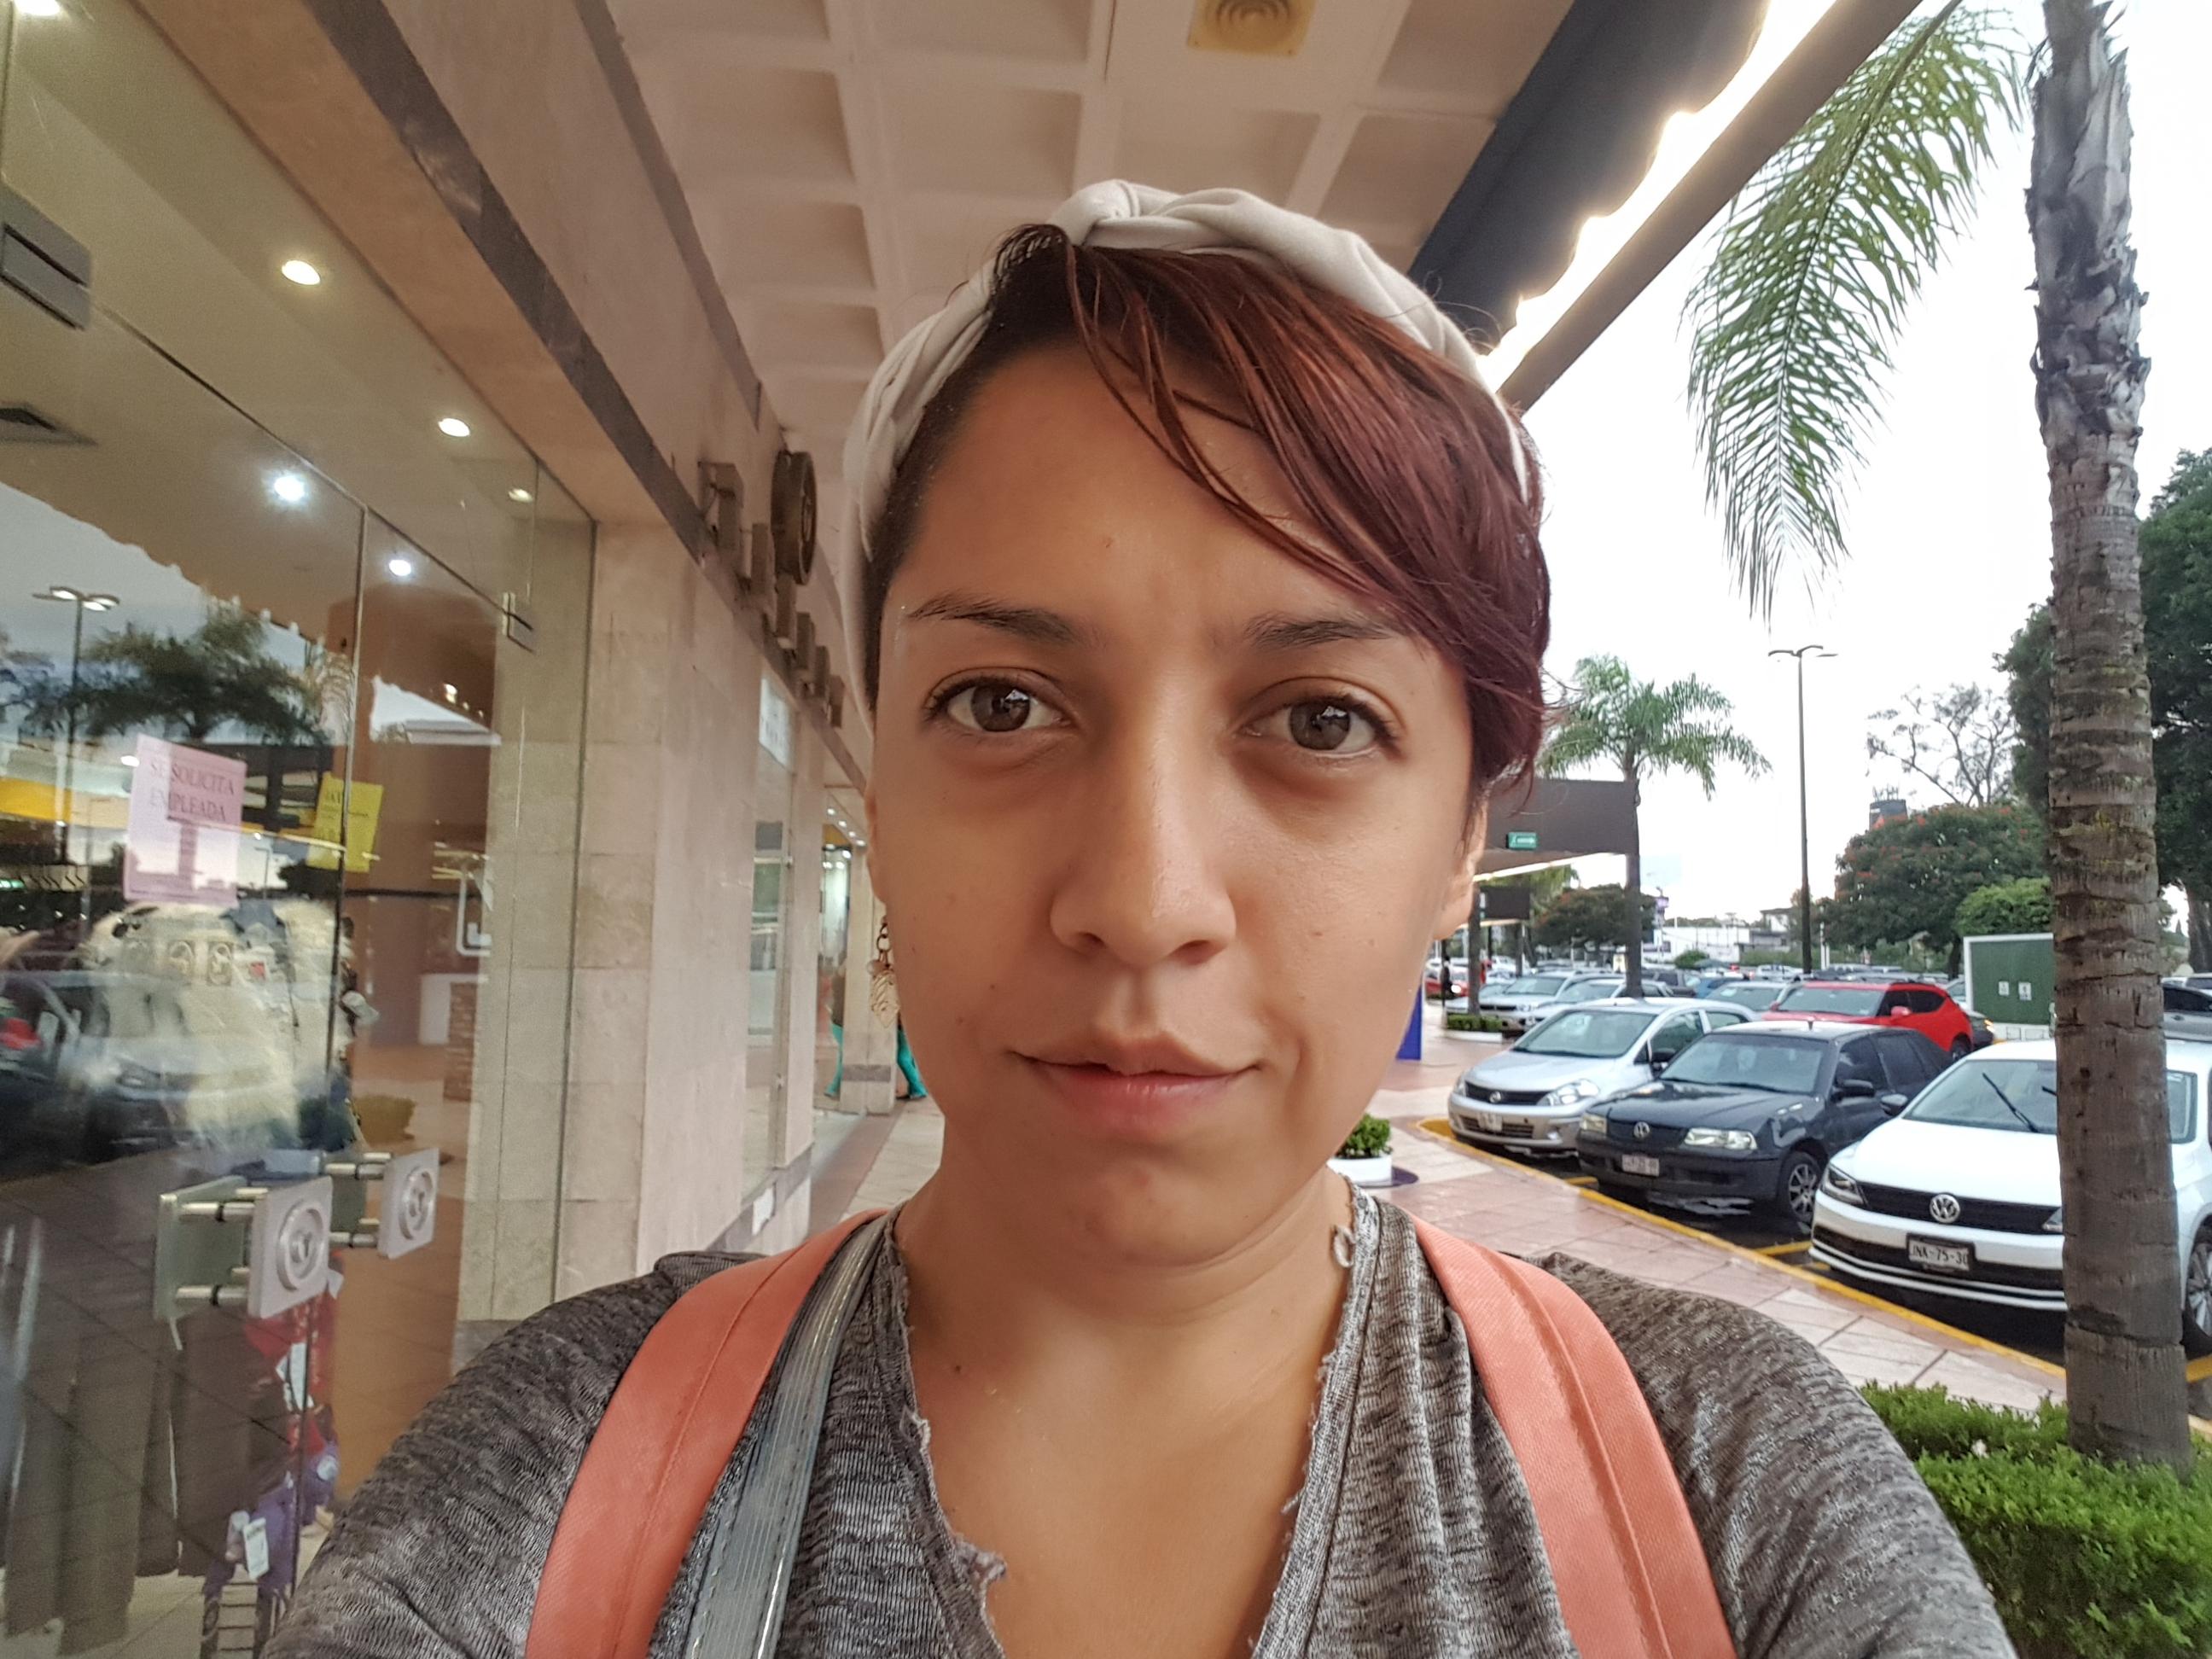 Gladys Trujillo